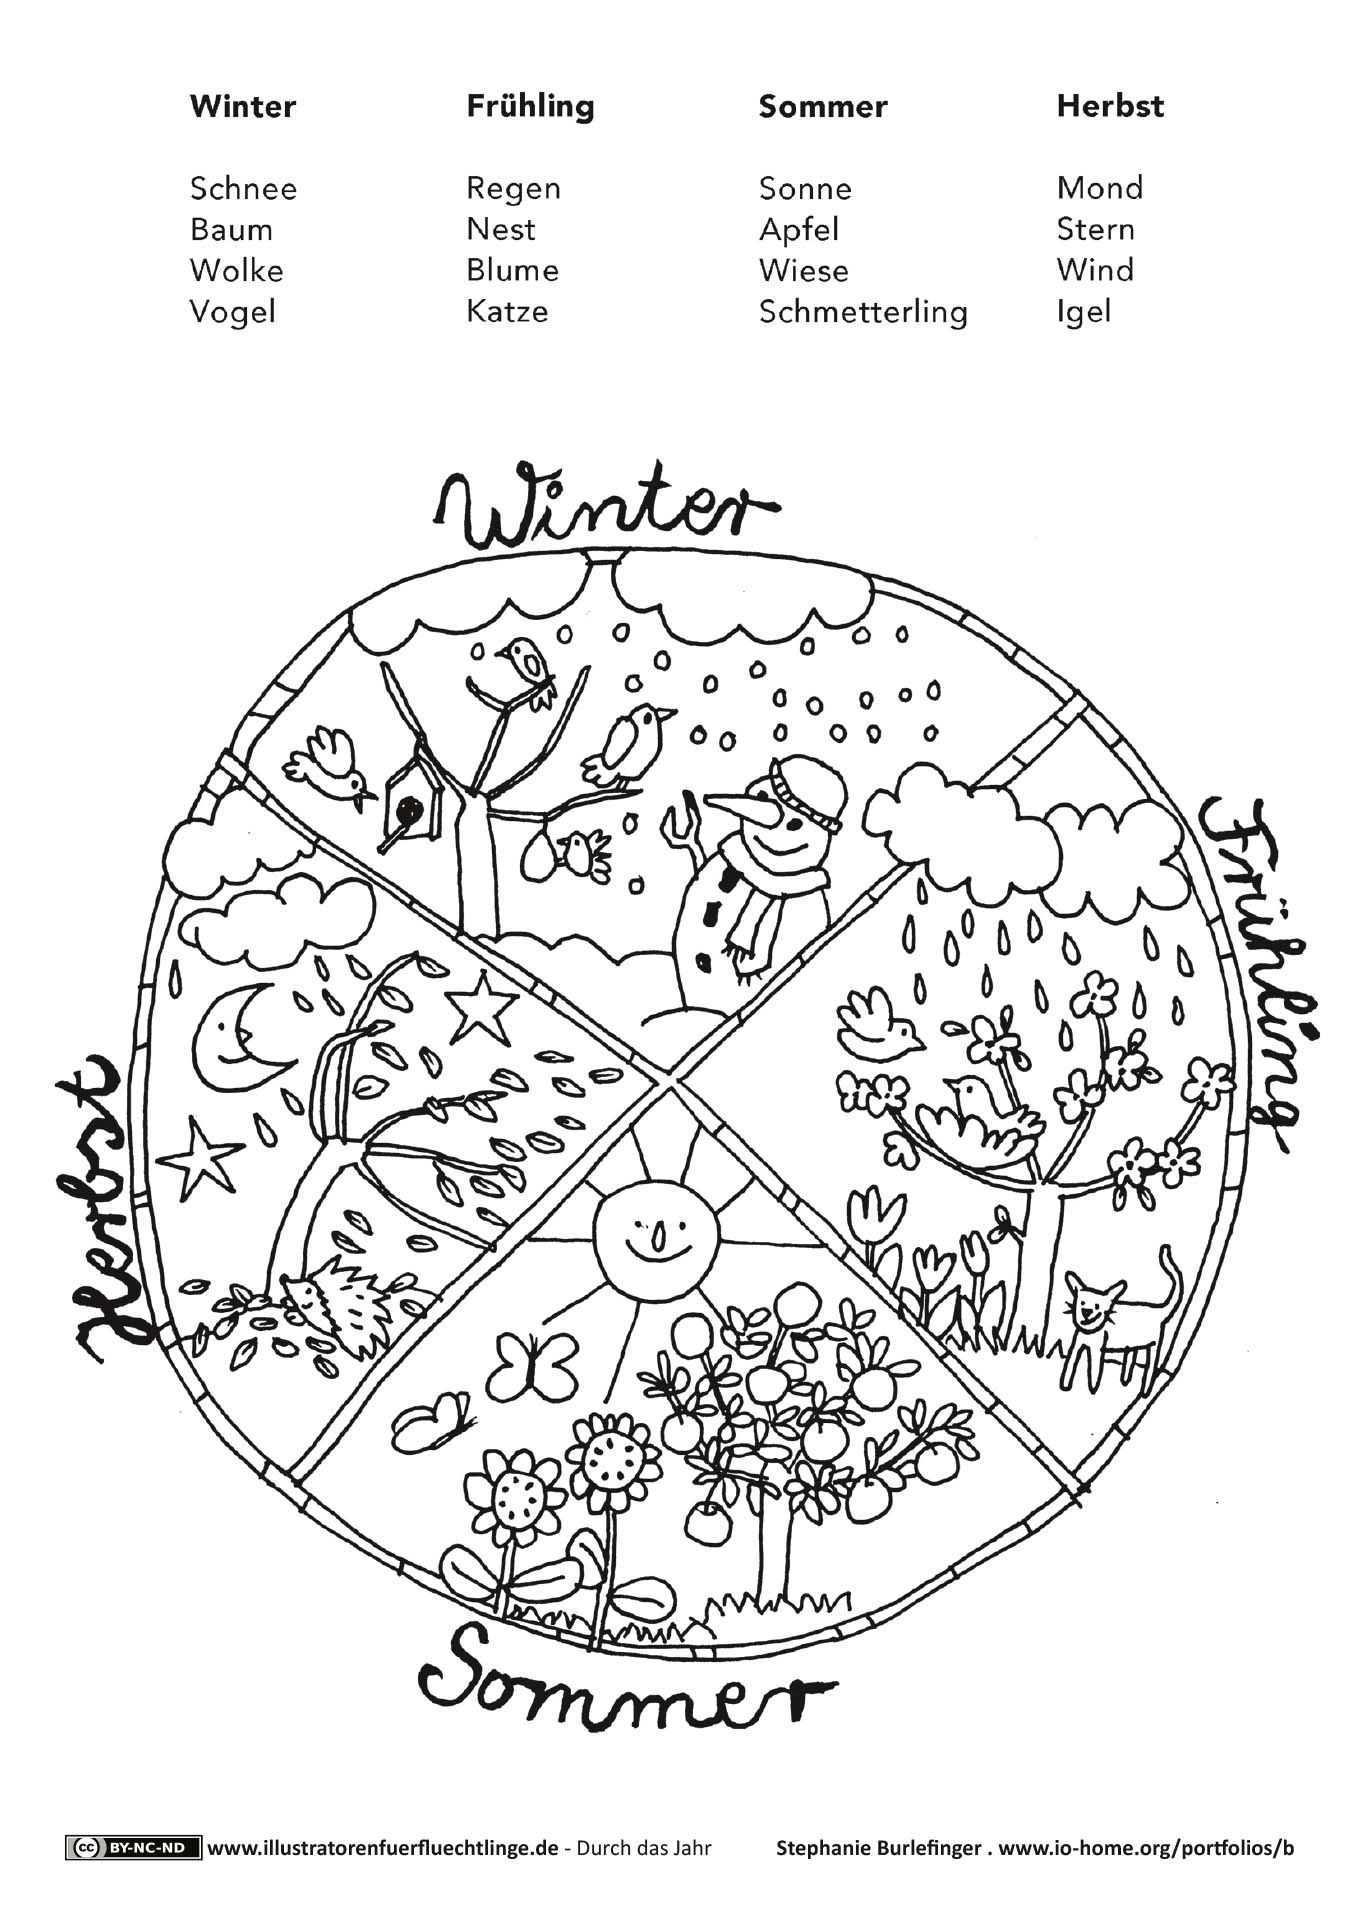 Jahrezeiten Mandala Jahreszeiten Mandalas Kinder Kunstunterricht Grundschule